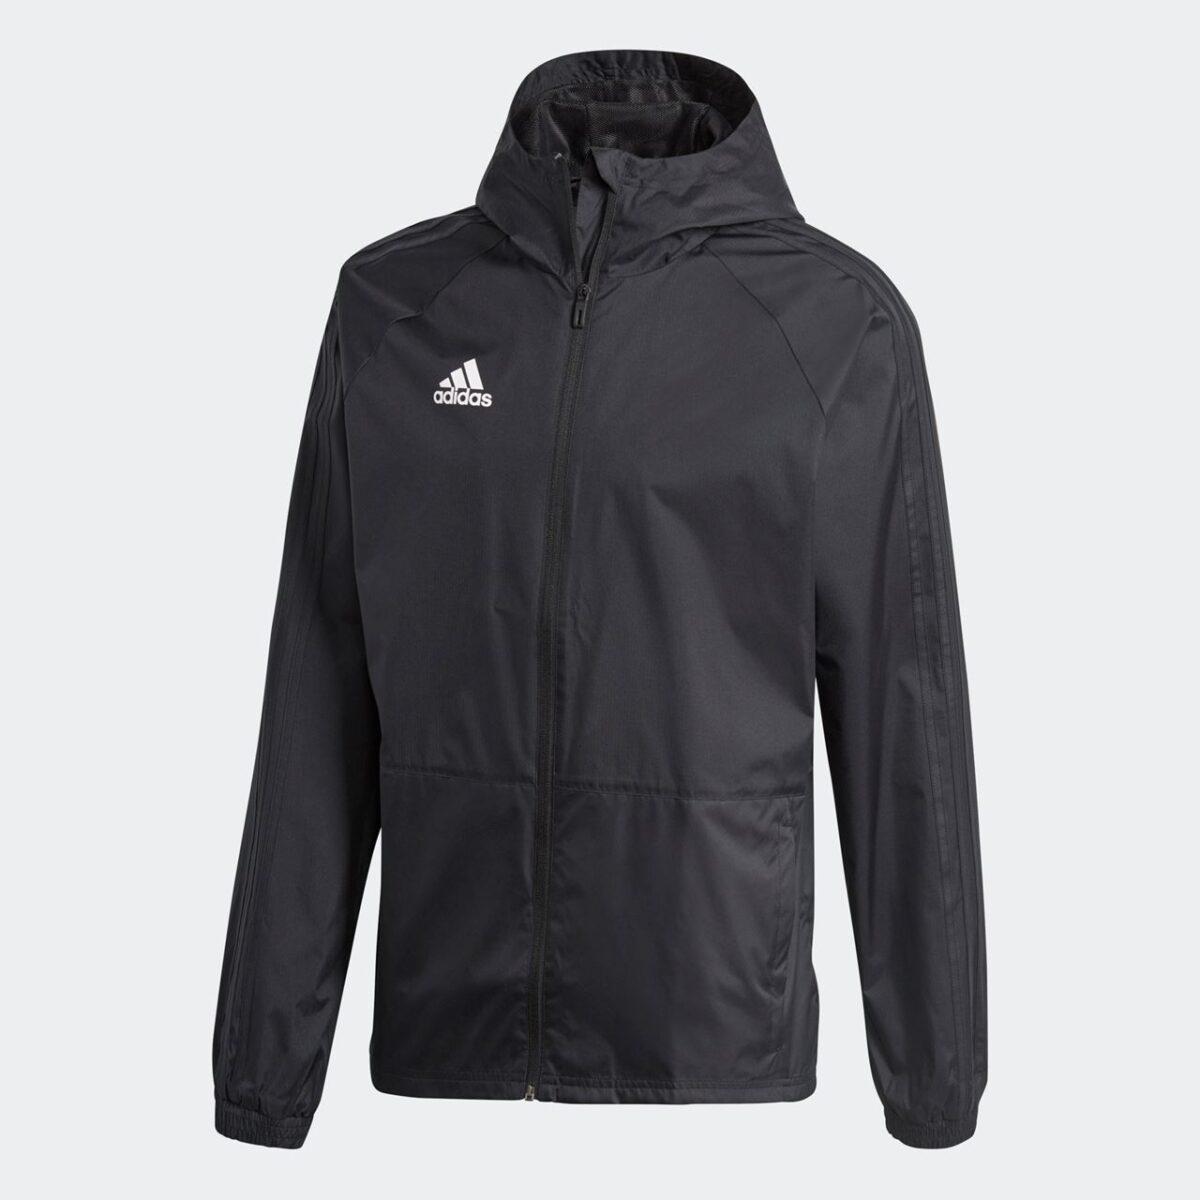 Adidas Condivo 18 Rain Jacket Adult